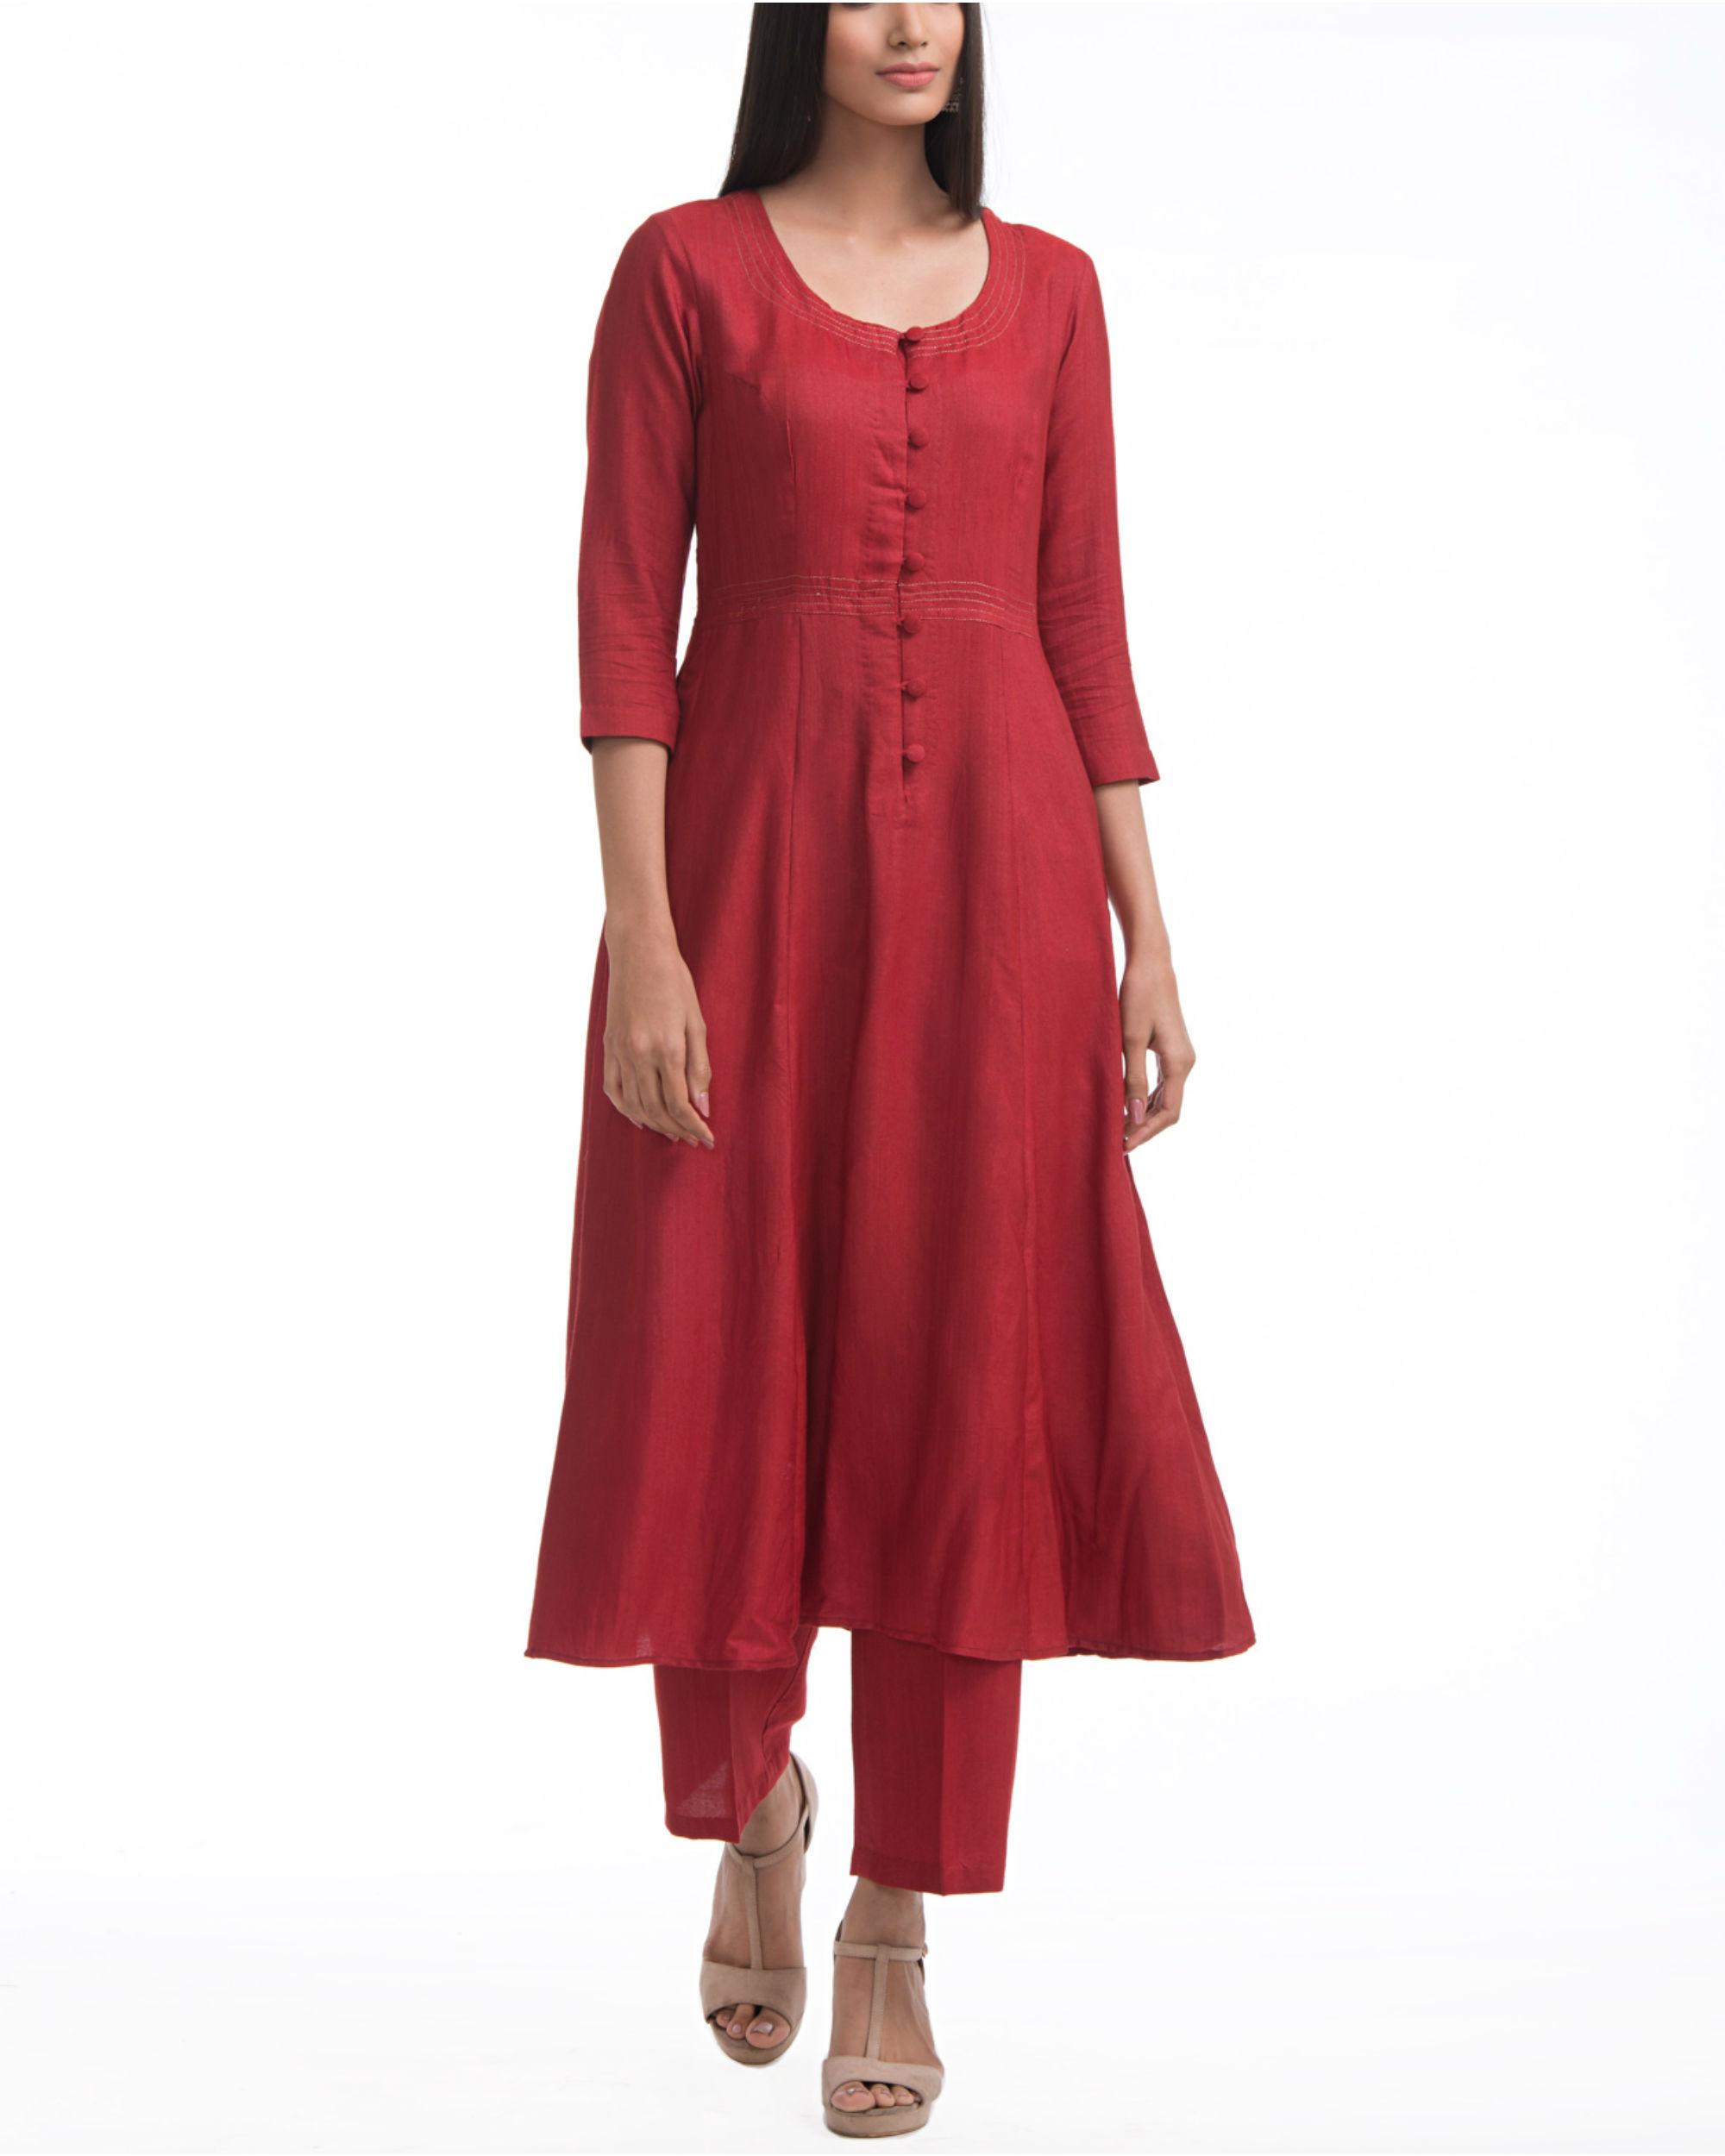 Maroon a-line yoke dress